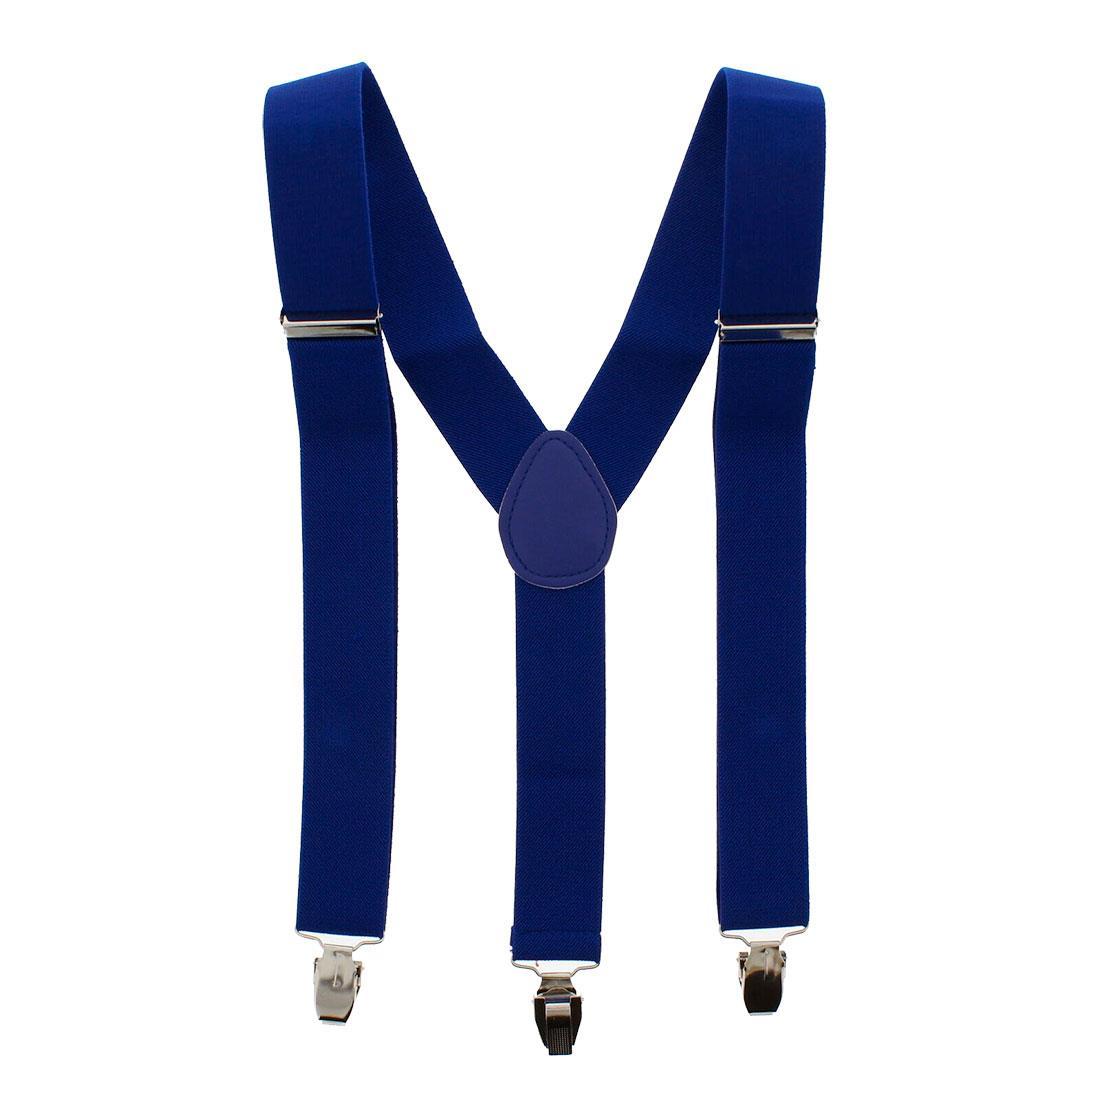 35mm Unisex Mens Men Braces Plain Wide And Heavy Duty Adjustable Suspenders